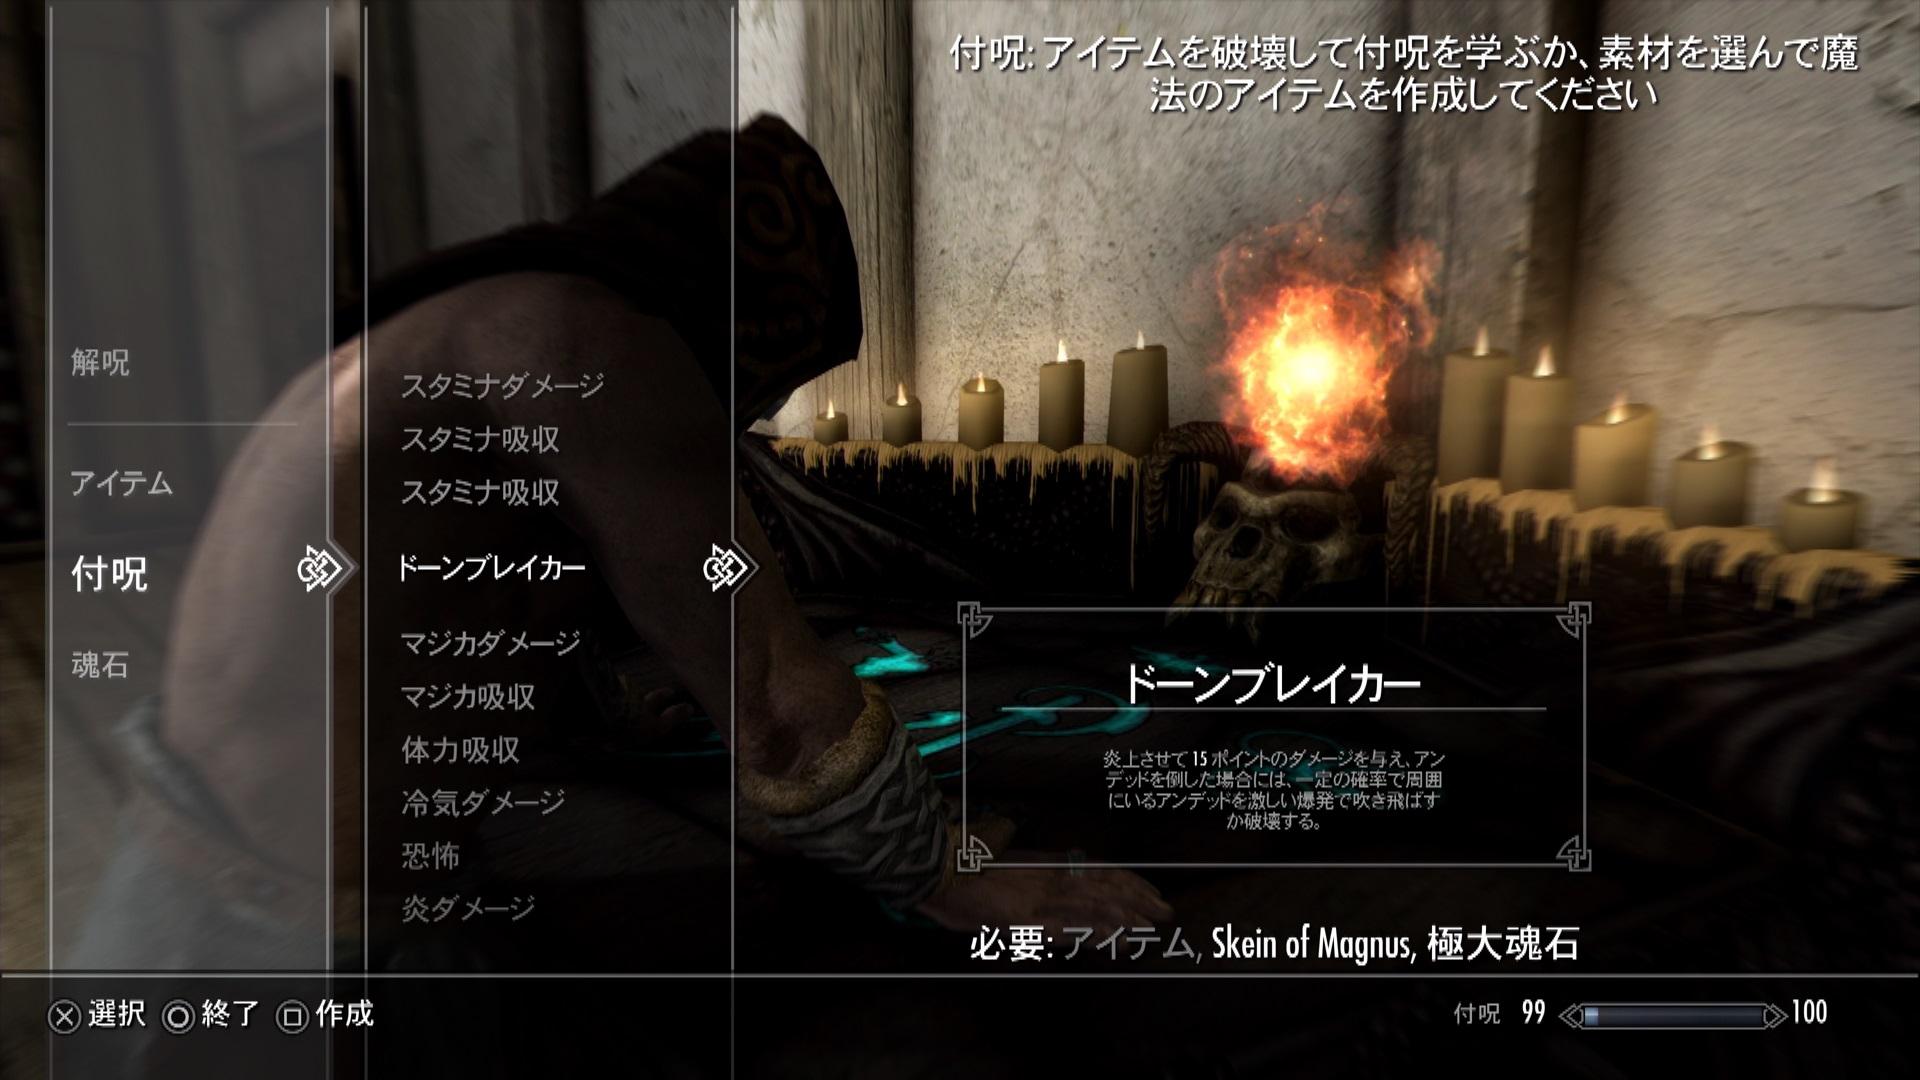 PS4スカイリム]MOD紹介39 - ゲームの玉子様